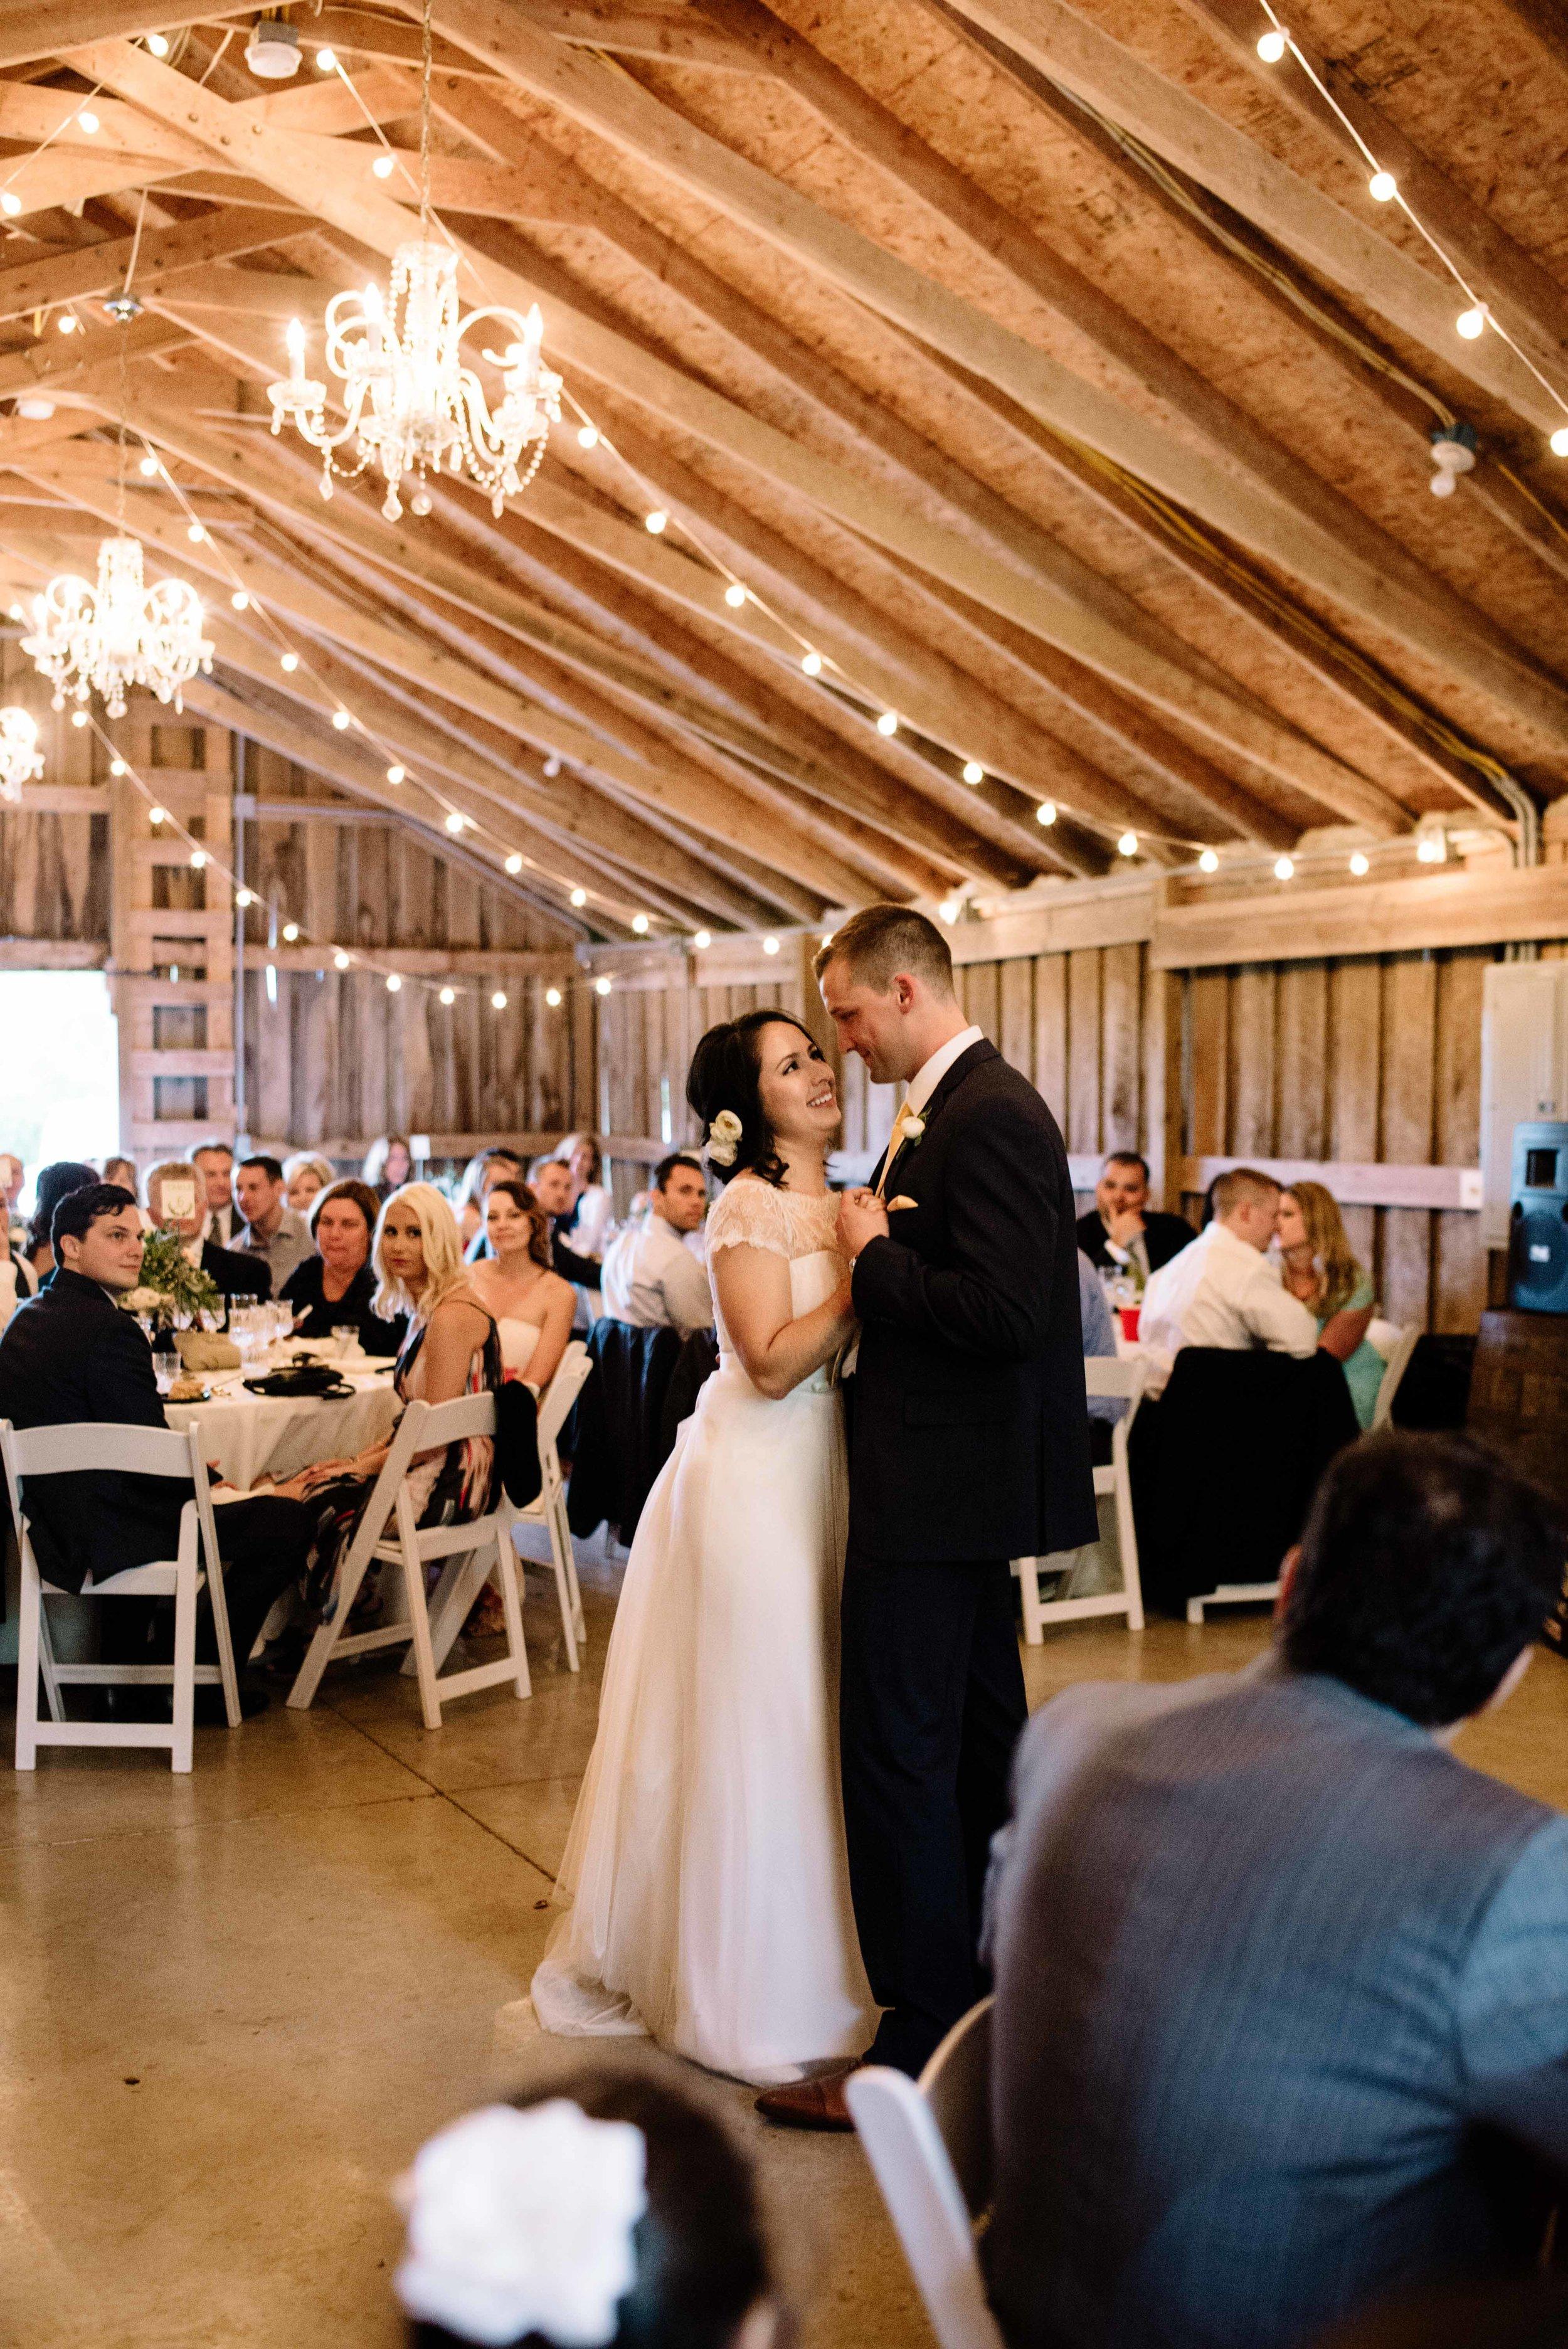 Ana-Dan-Blog-Indianapolis-Wedding-108.jpg